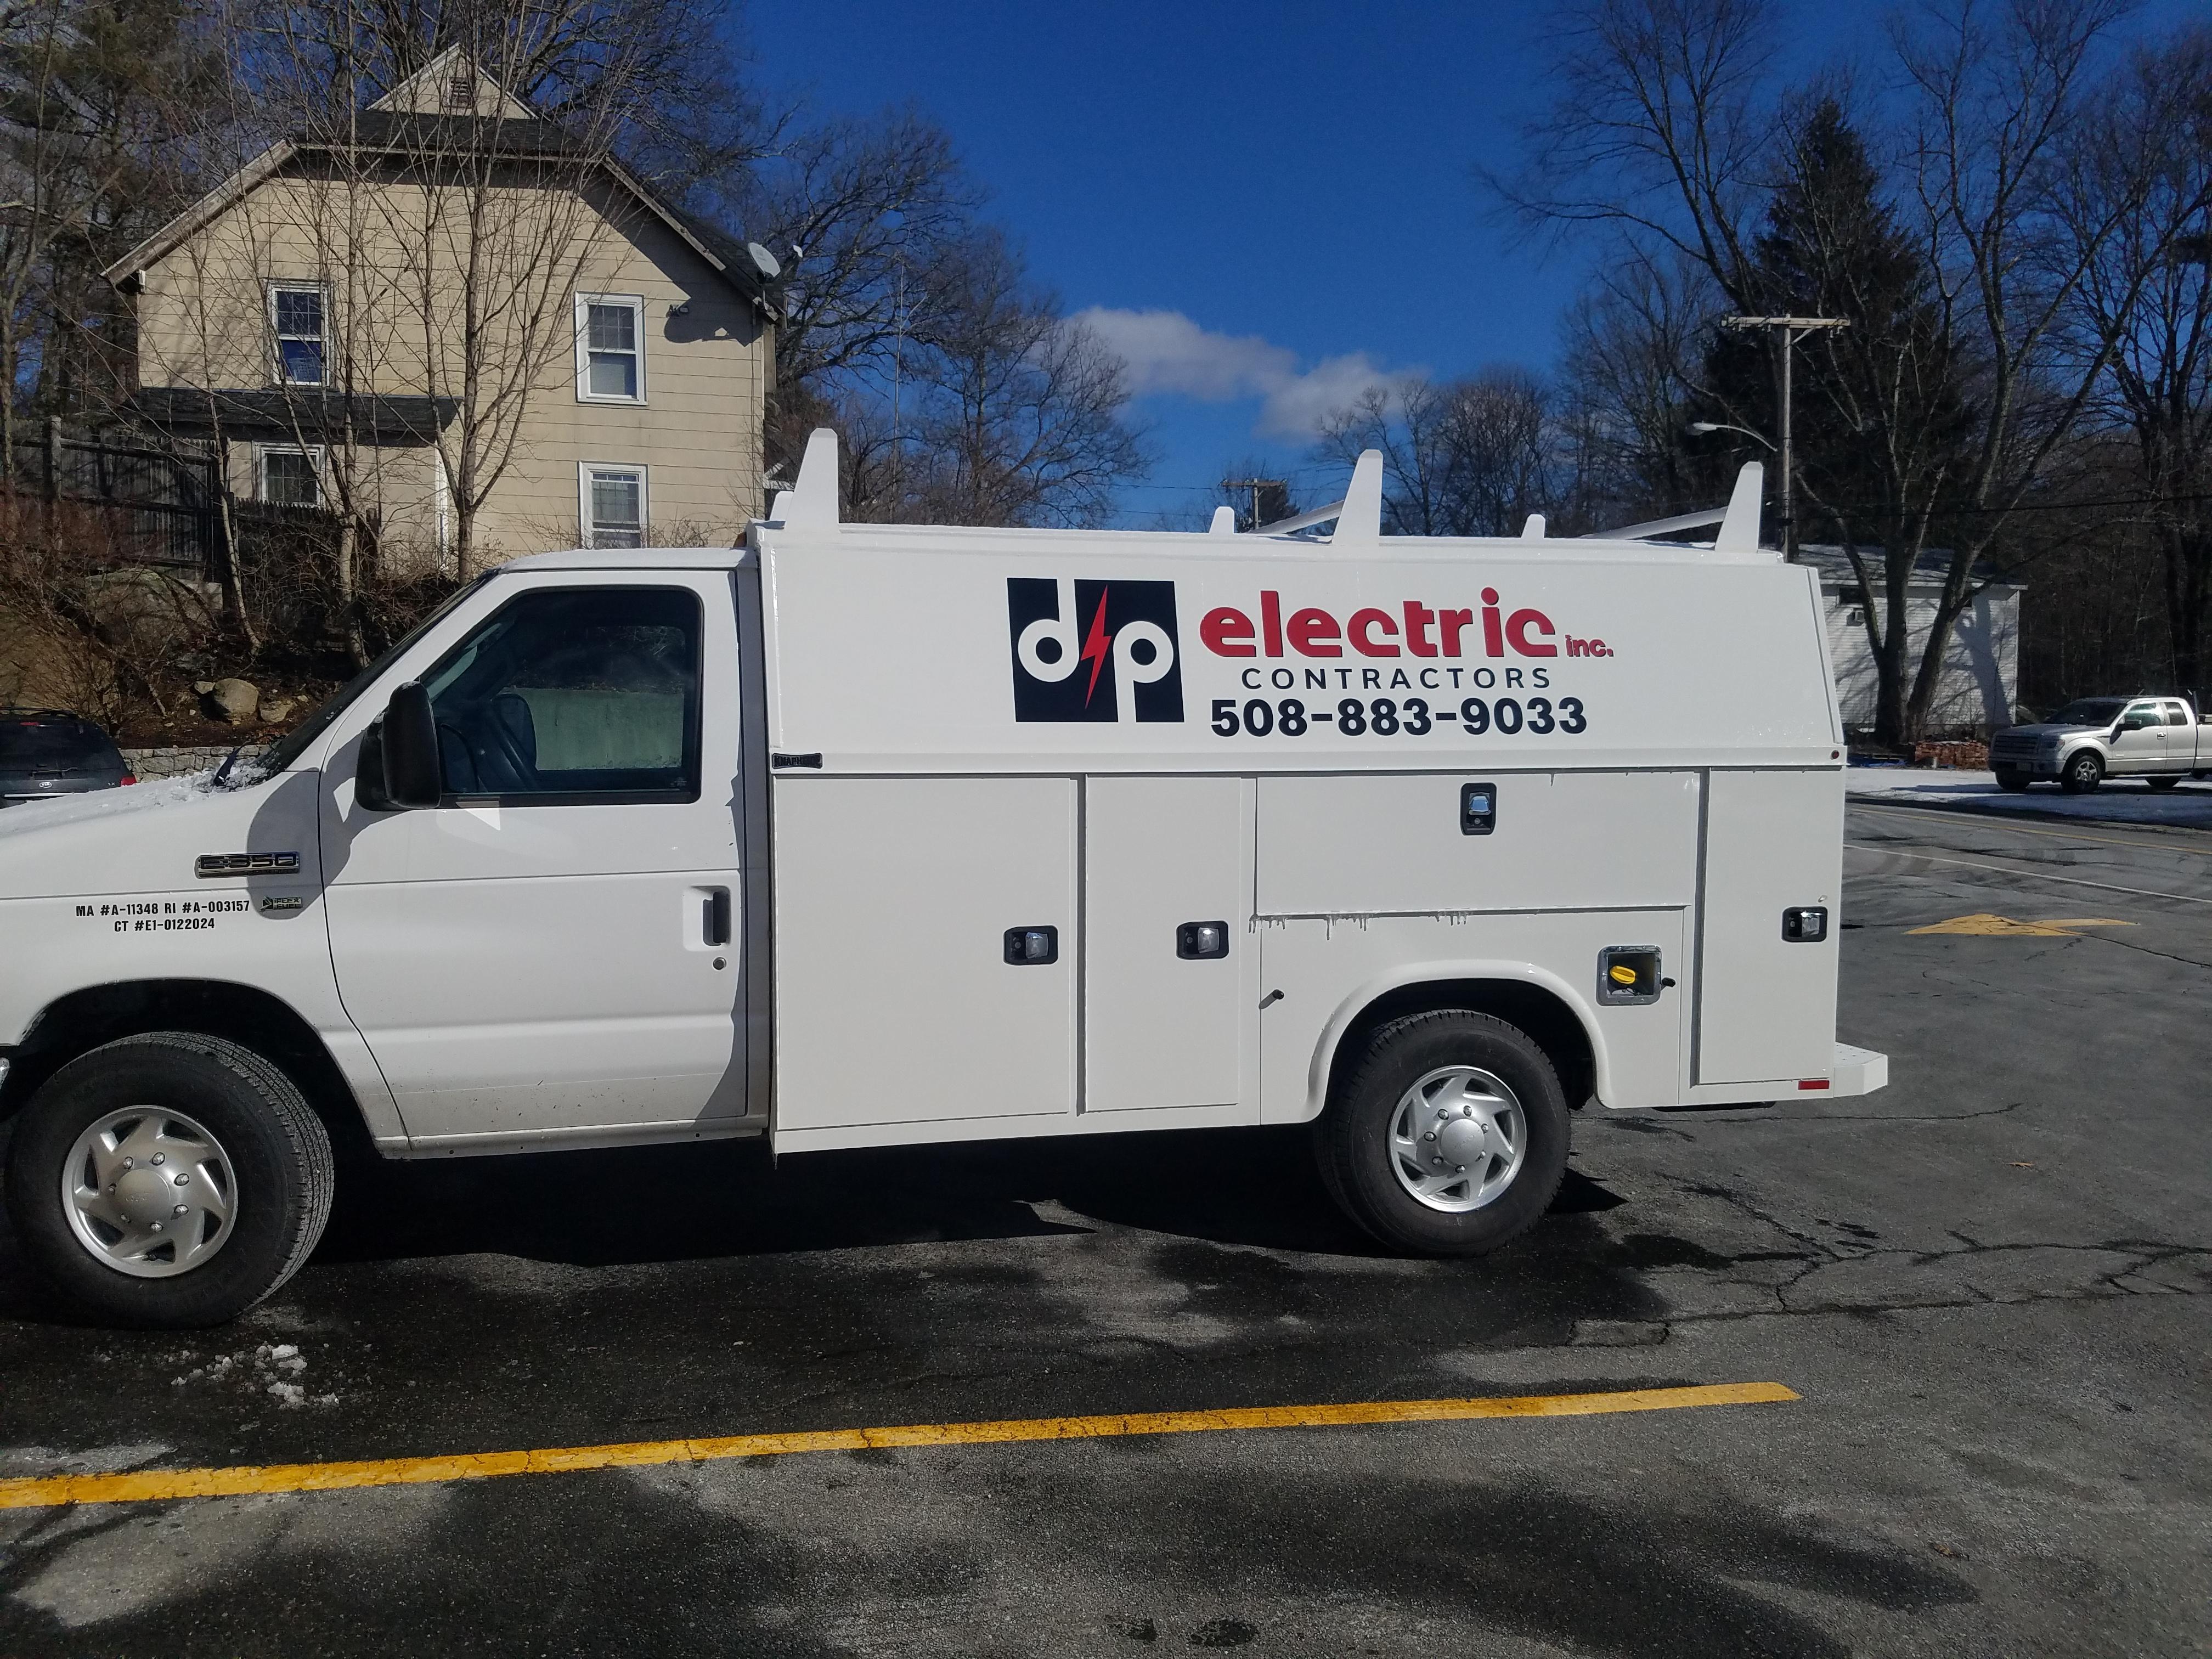 DP Electric Inc image 1